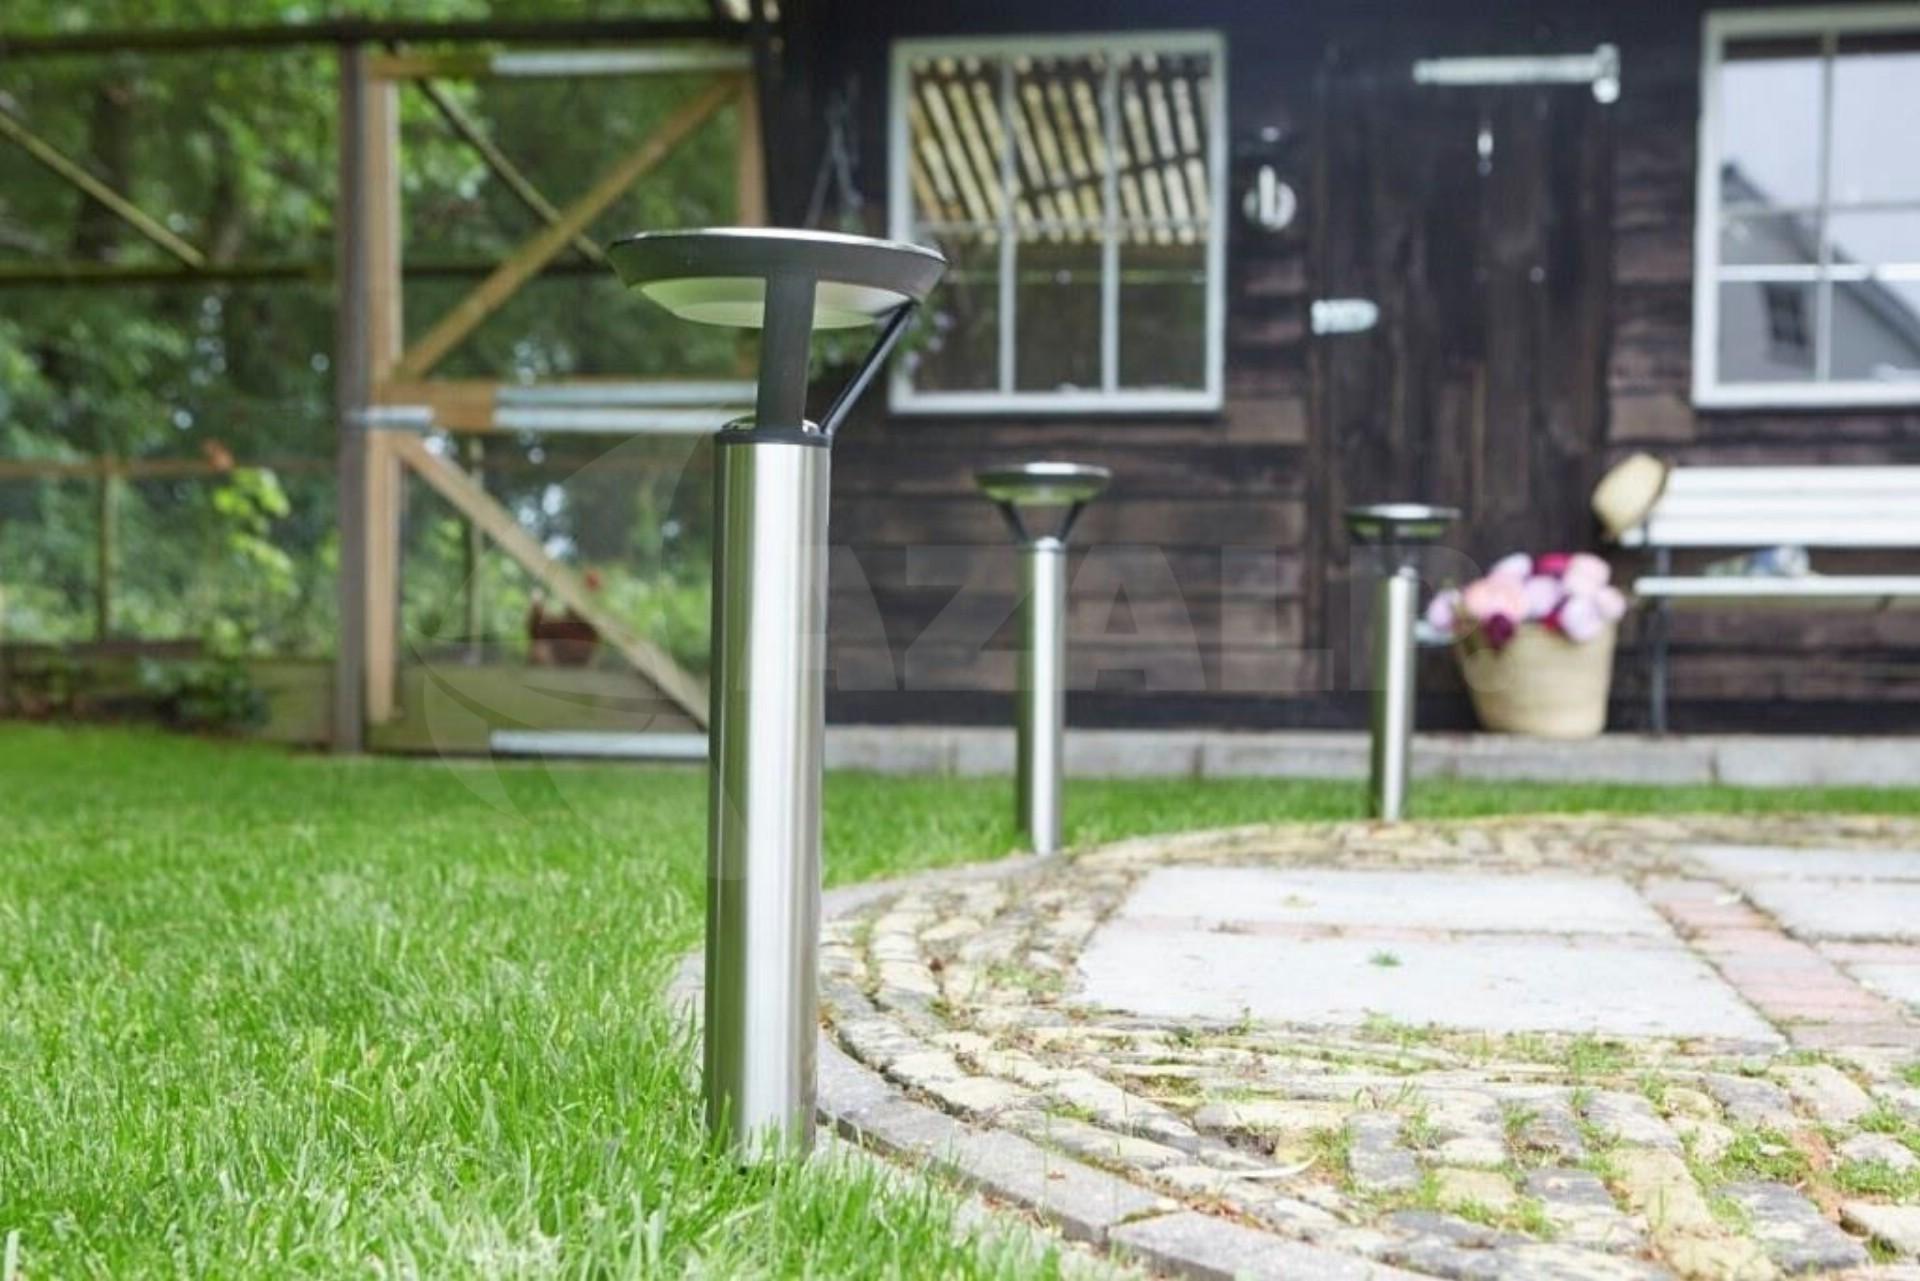 Solar Inbouwspots Tuin : Solar spots tuin luxform solar cannes solarverlichting enjoy your